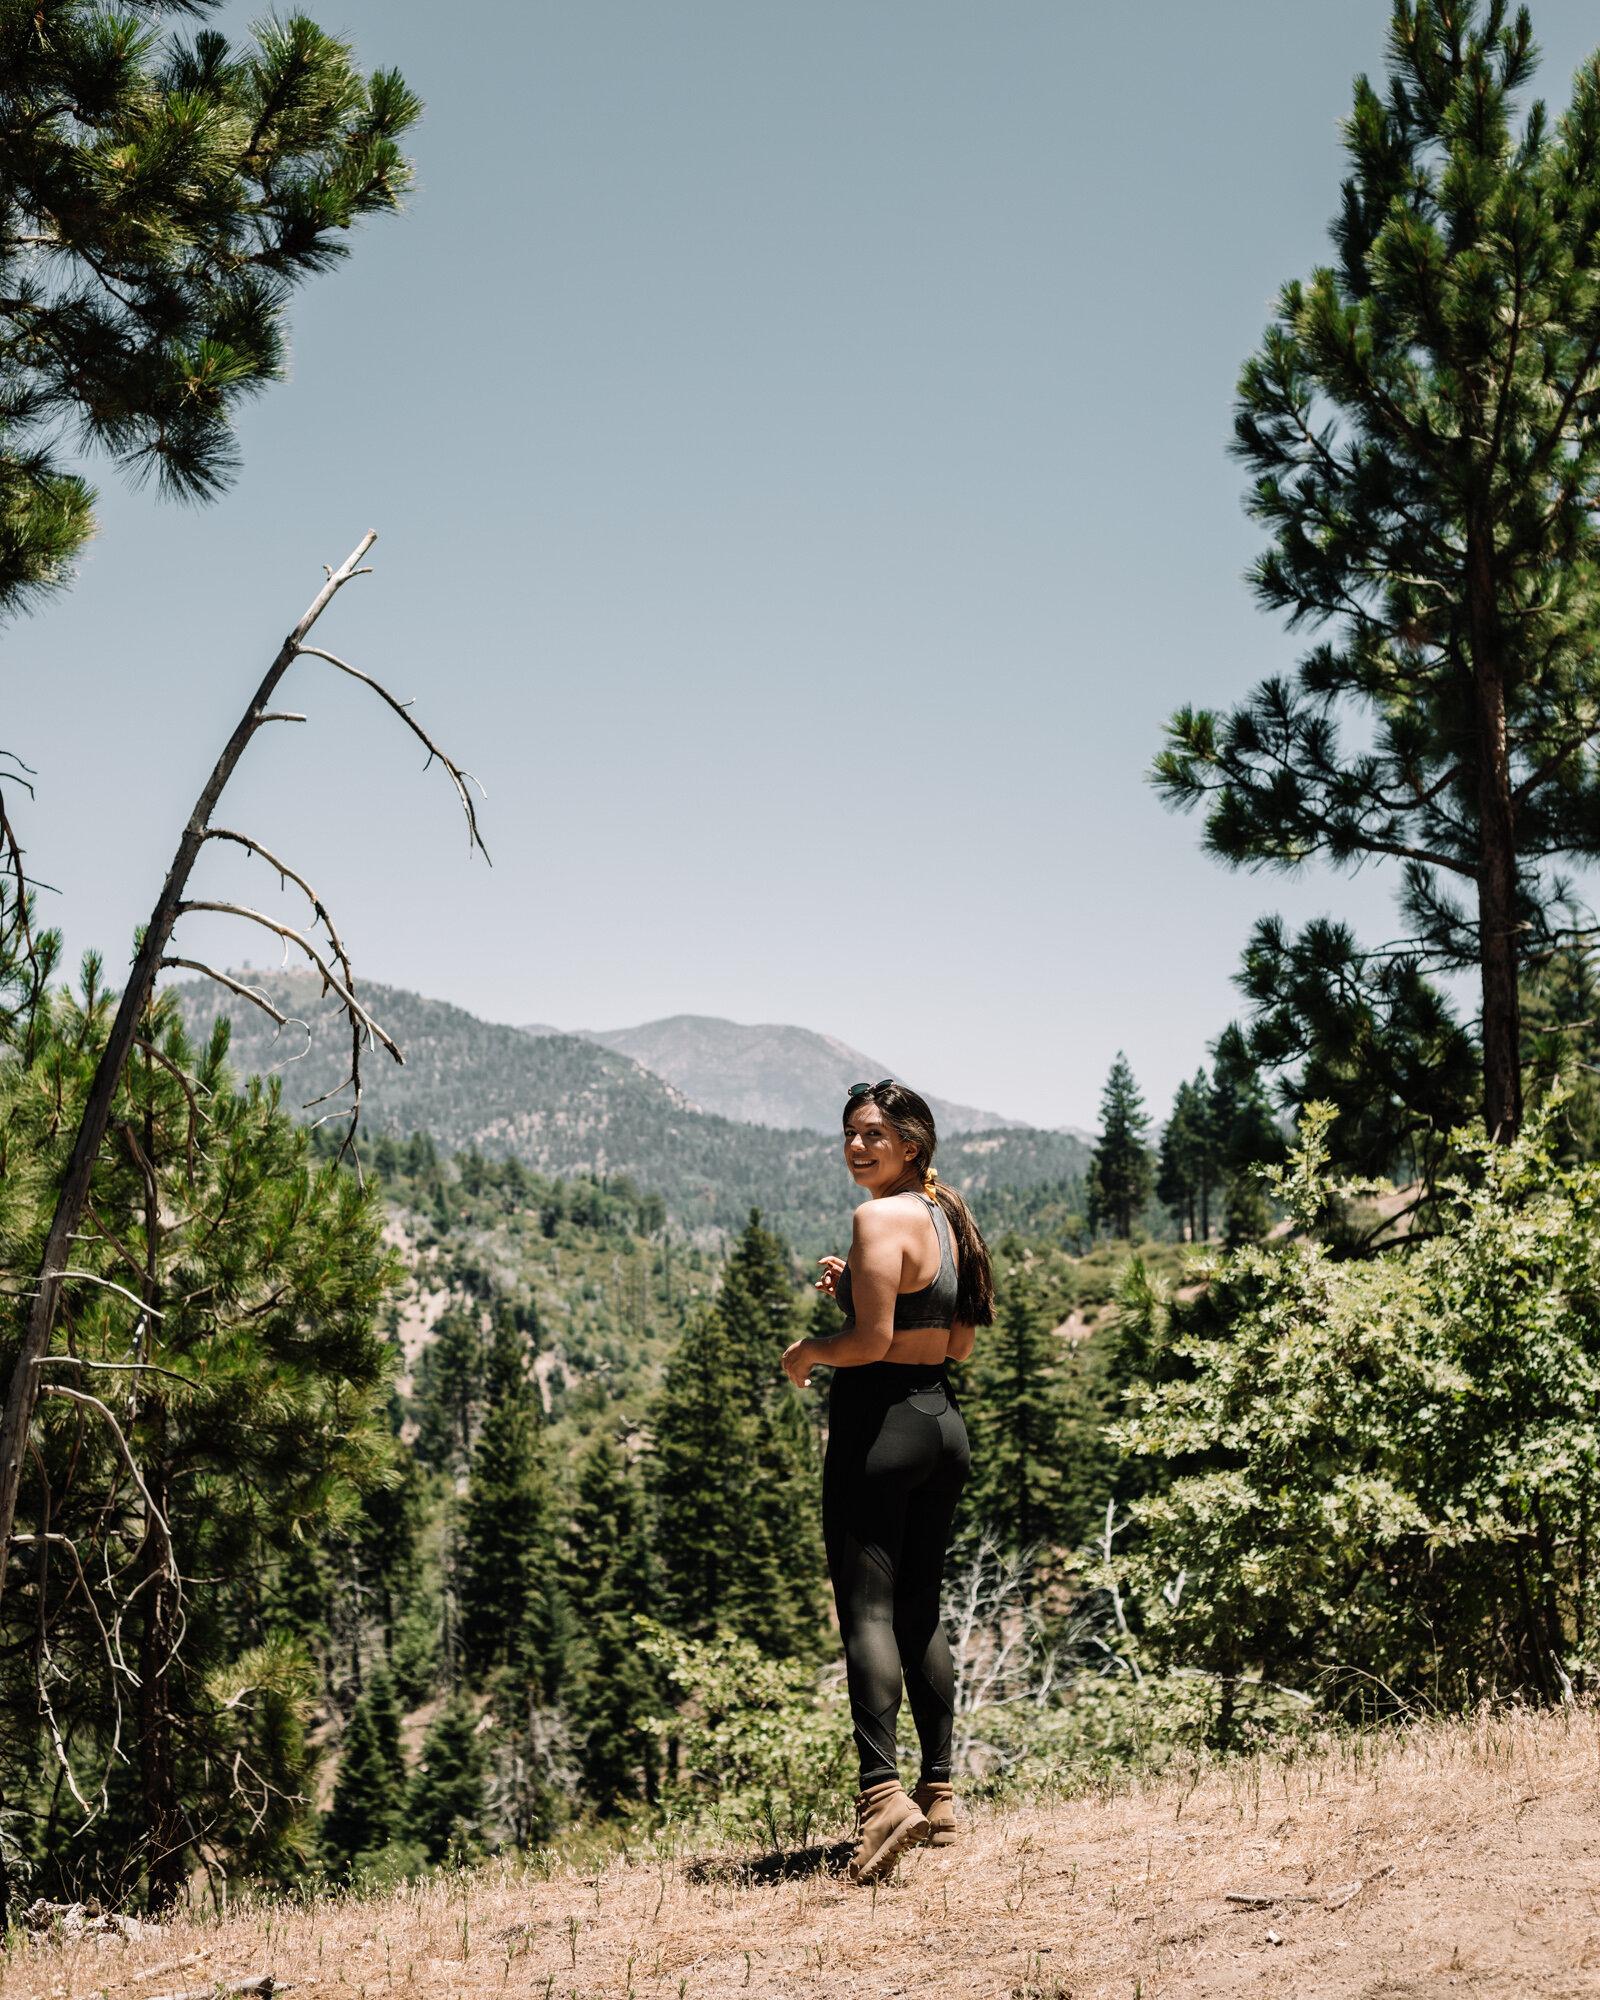 Rachel Off Duty: Woman Hiking in Big Bear, California